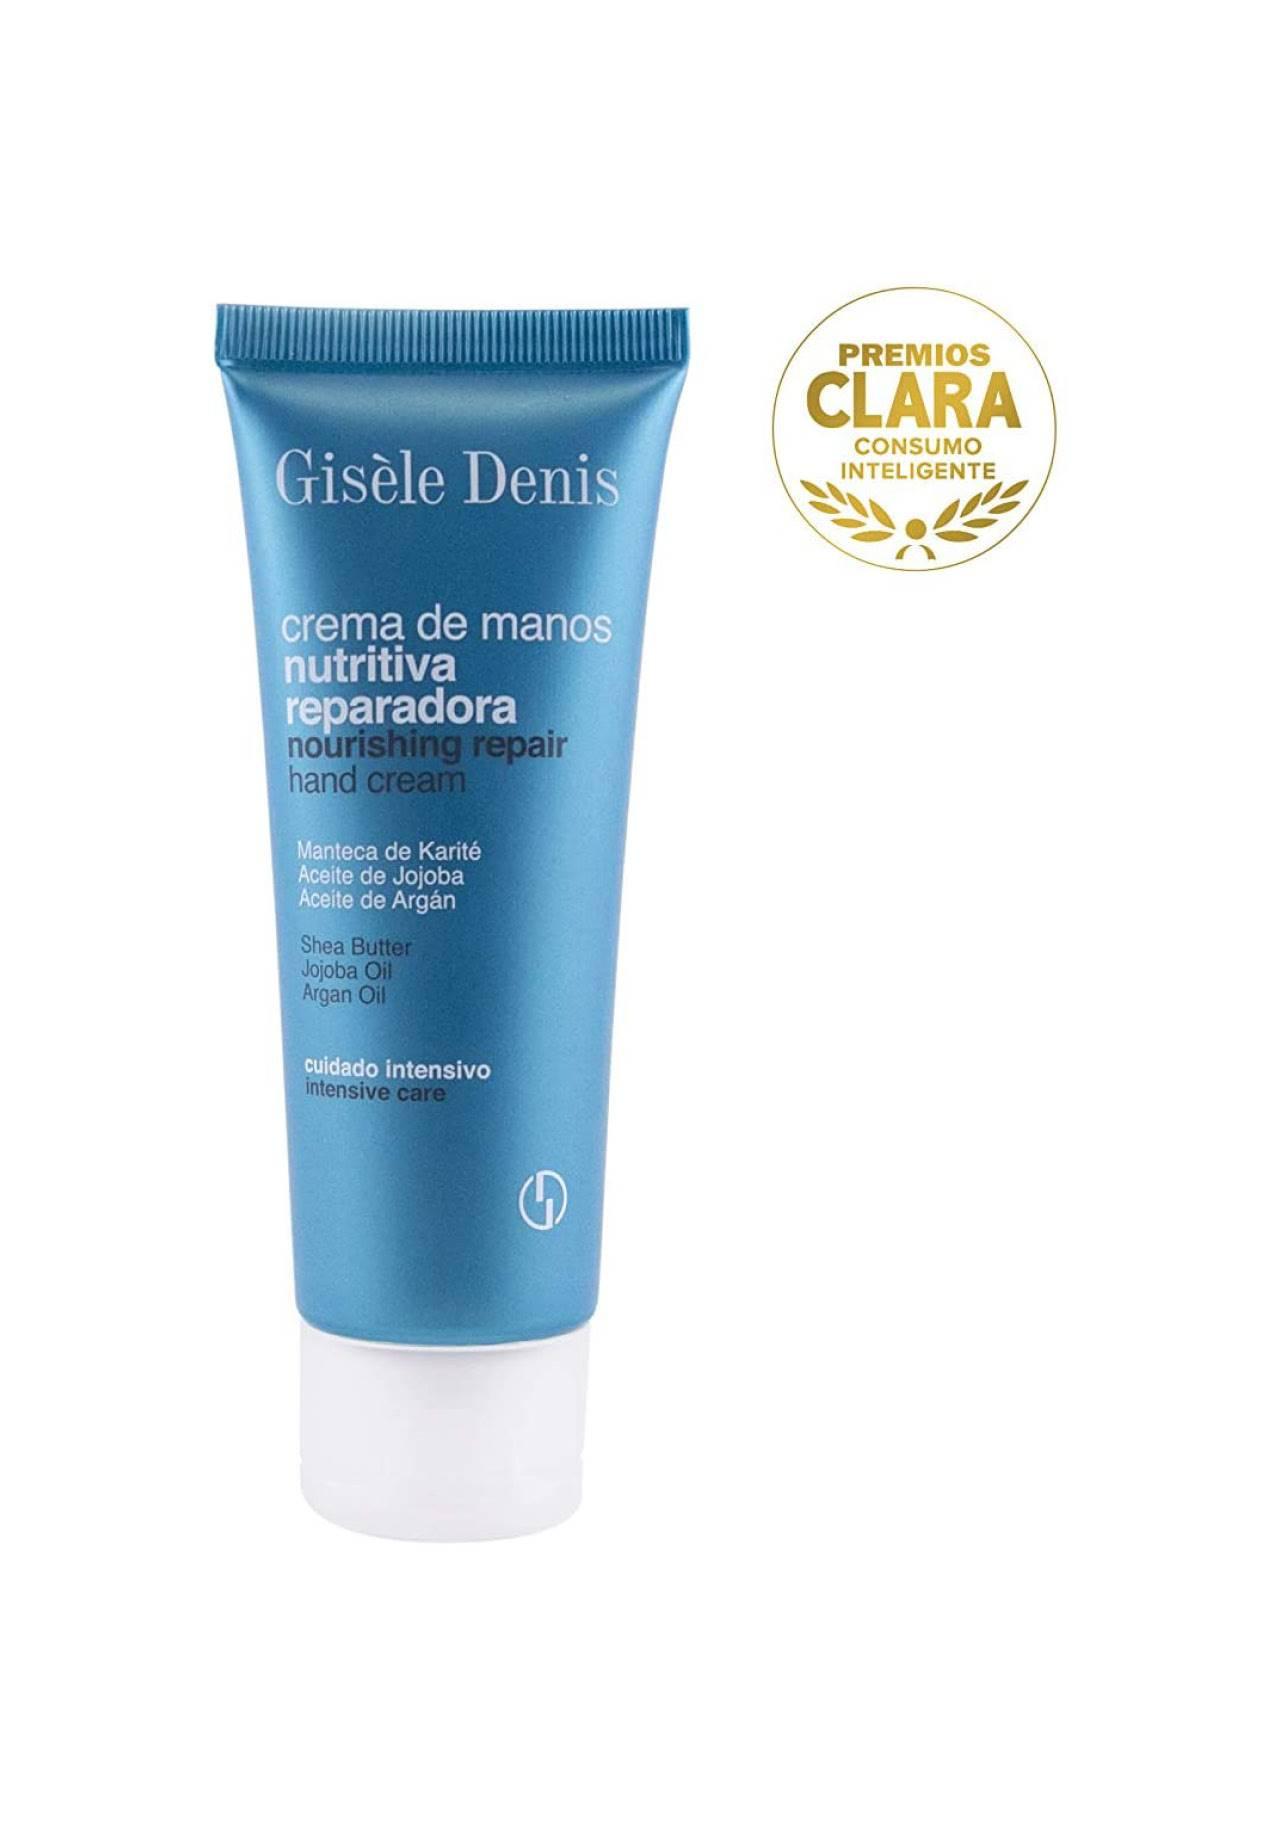 Repairing hand creams Gisèle Denis nourishing and repairing gentle cream